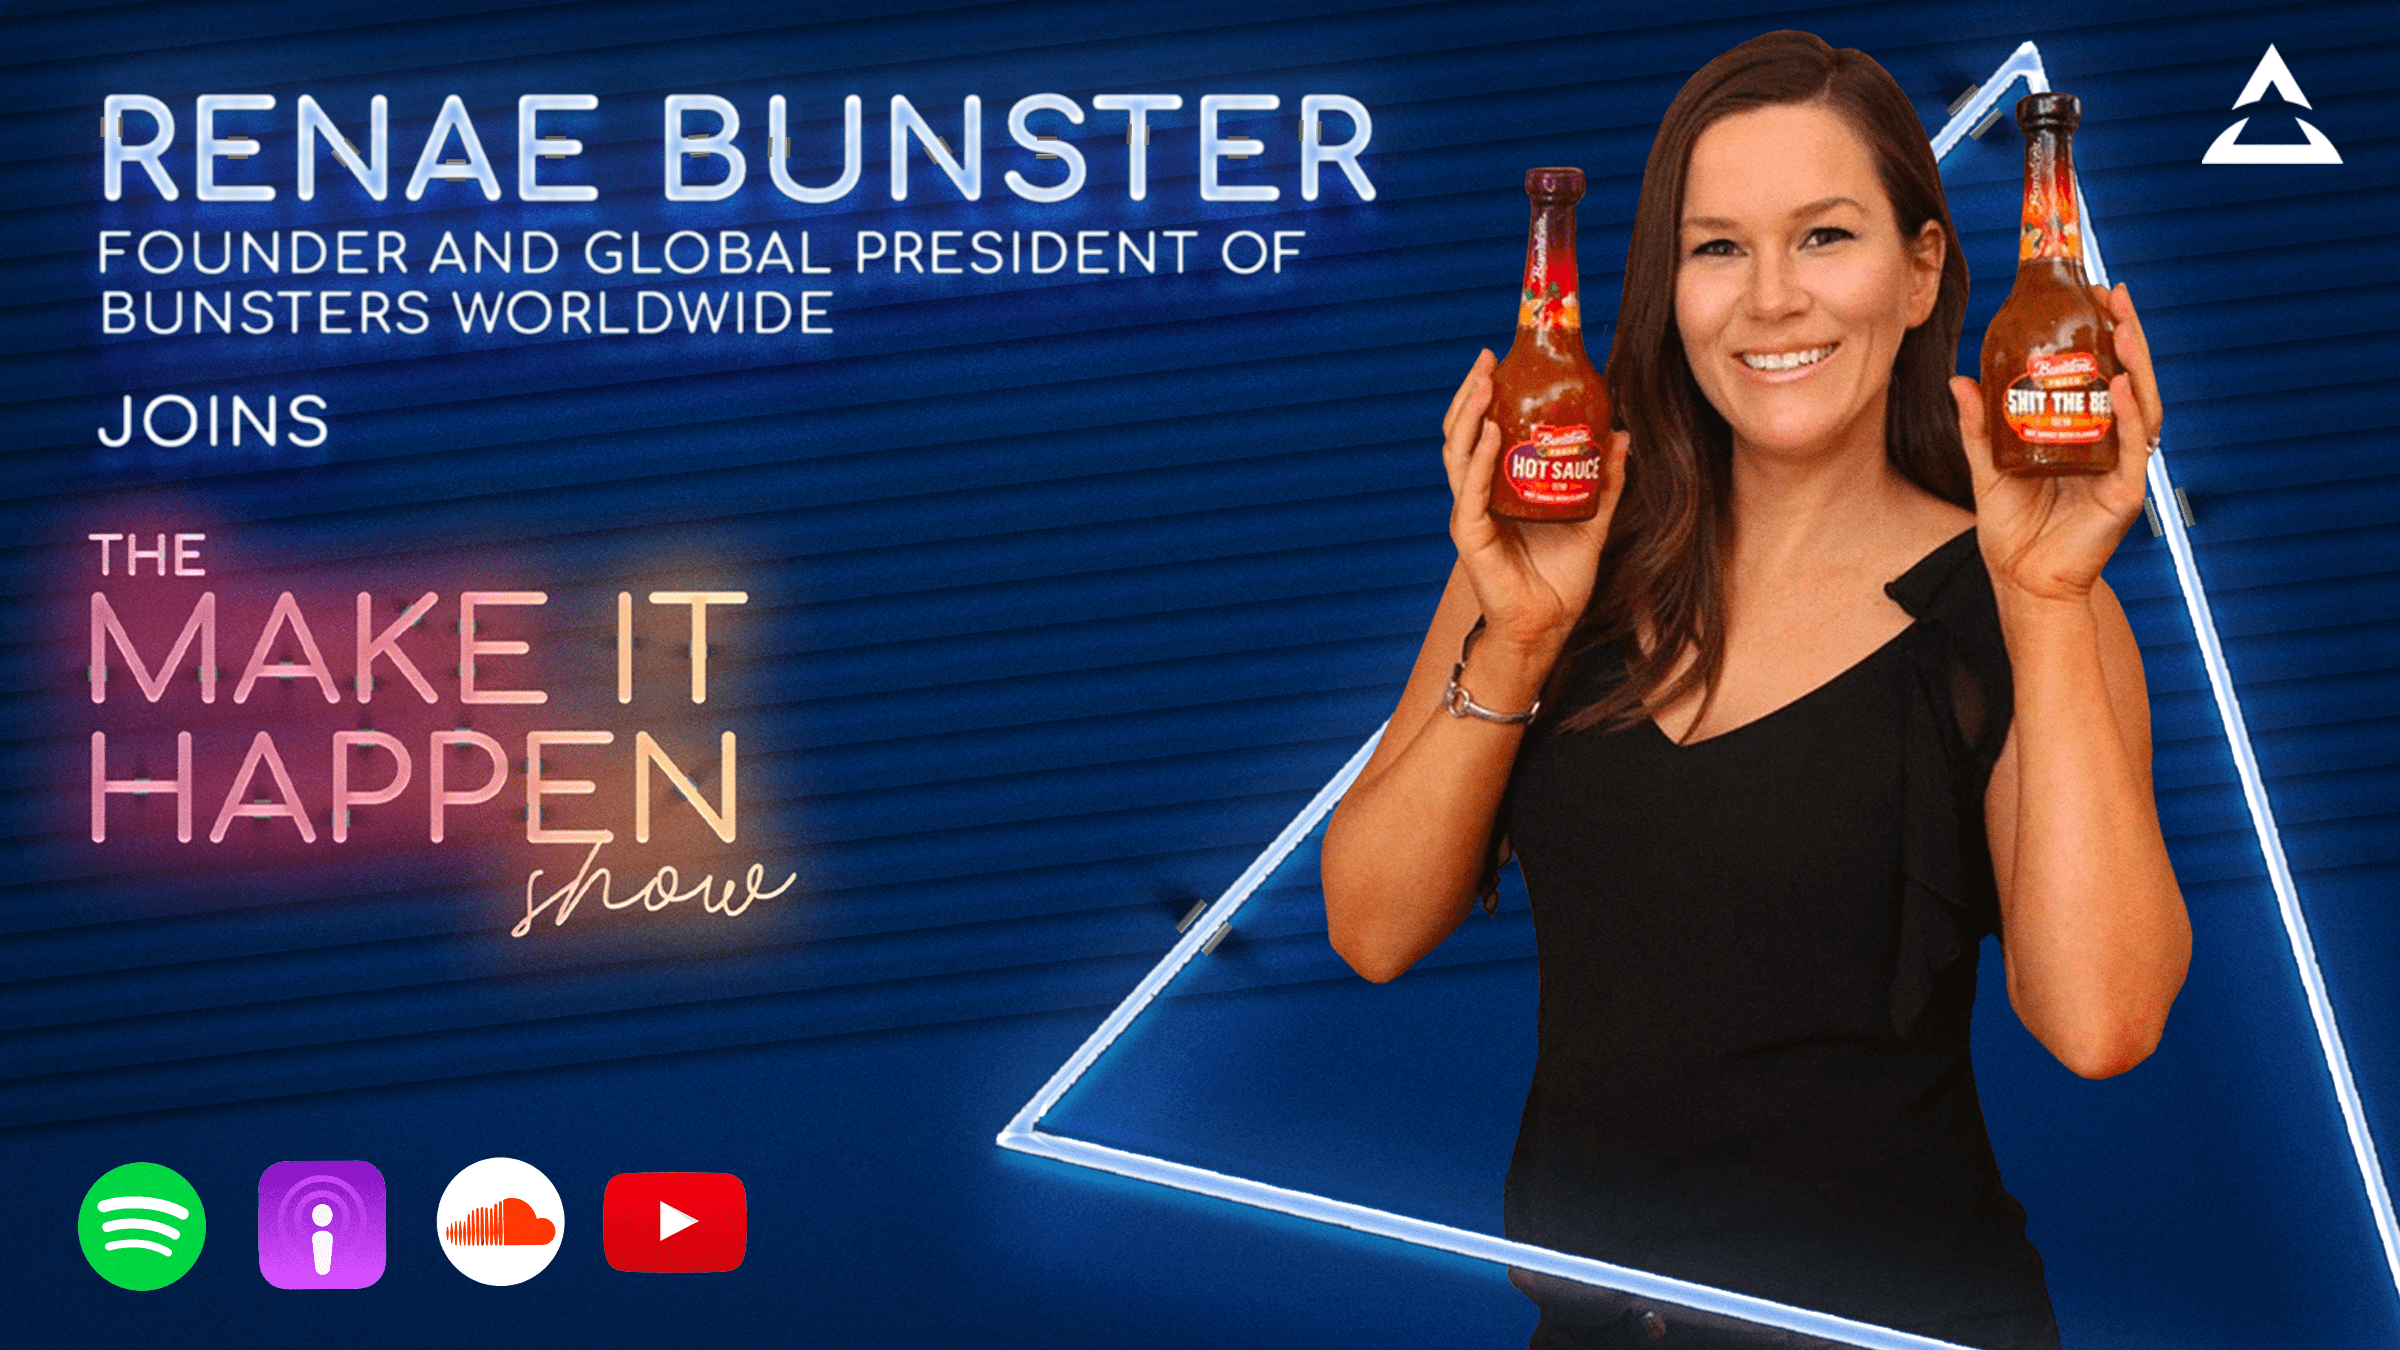 31. Renae Bunster promotional image for The Make It Happen Show